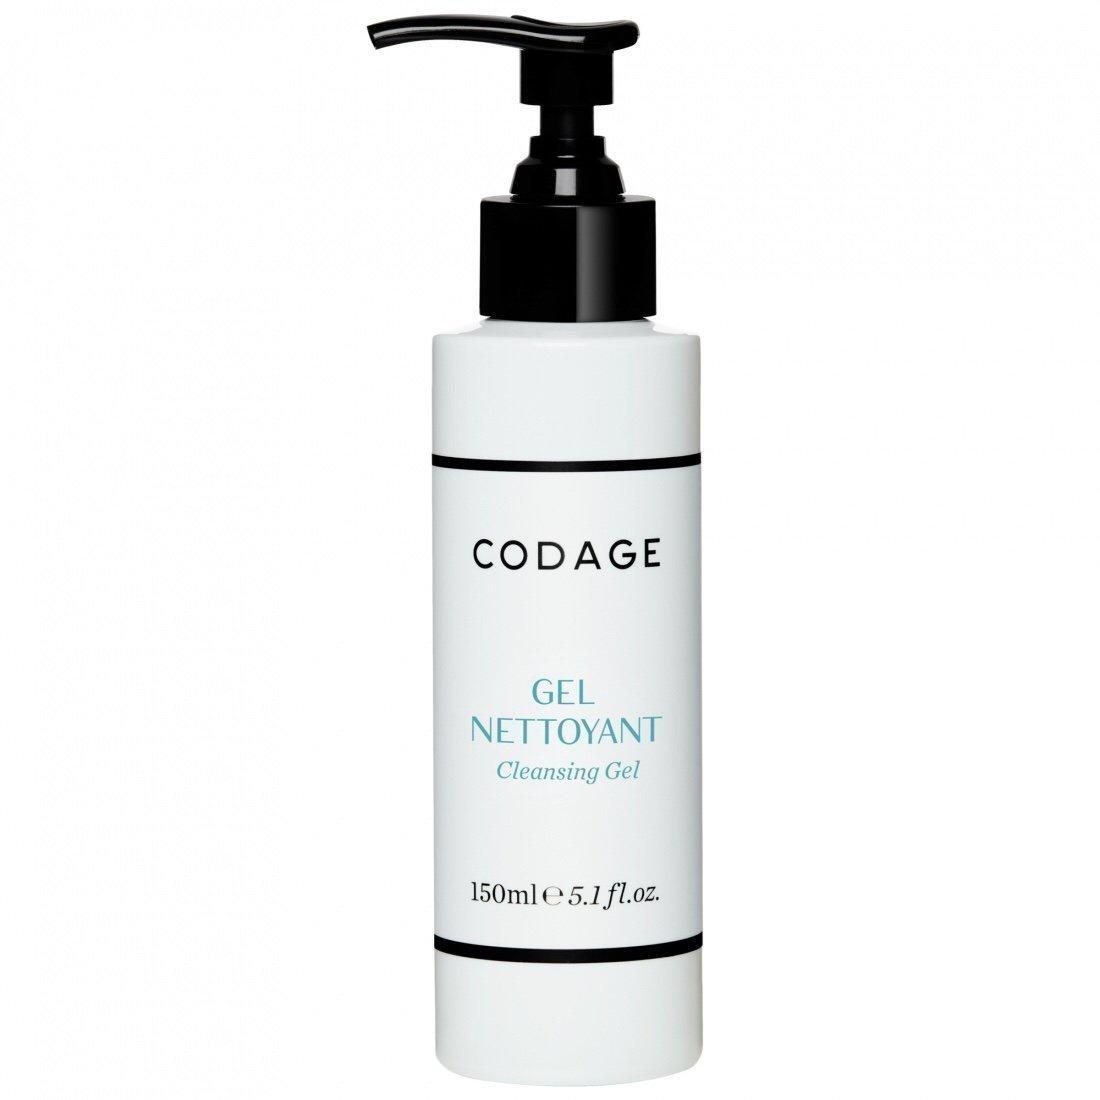 Codage Cleansing Gel